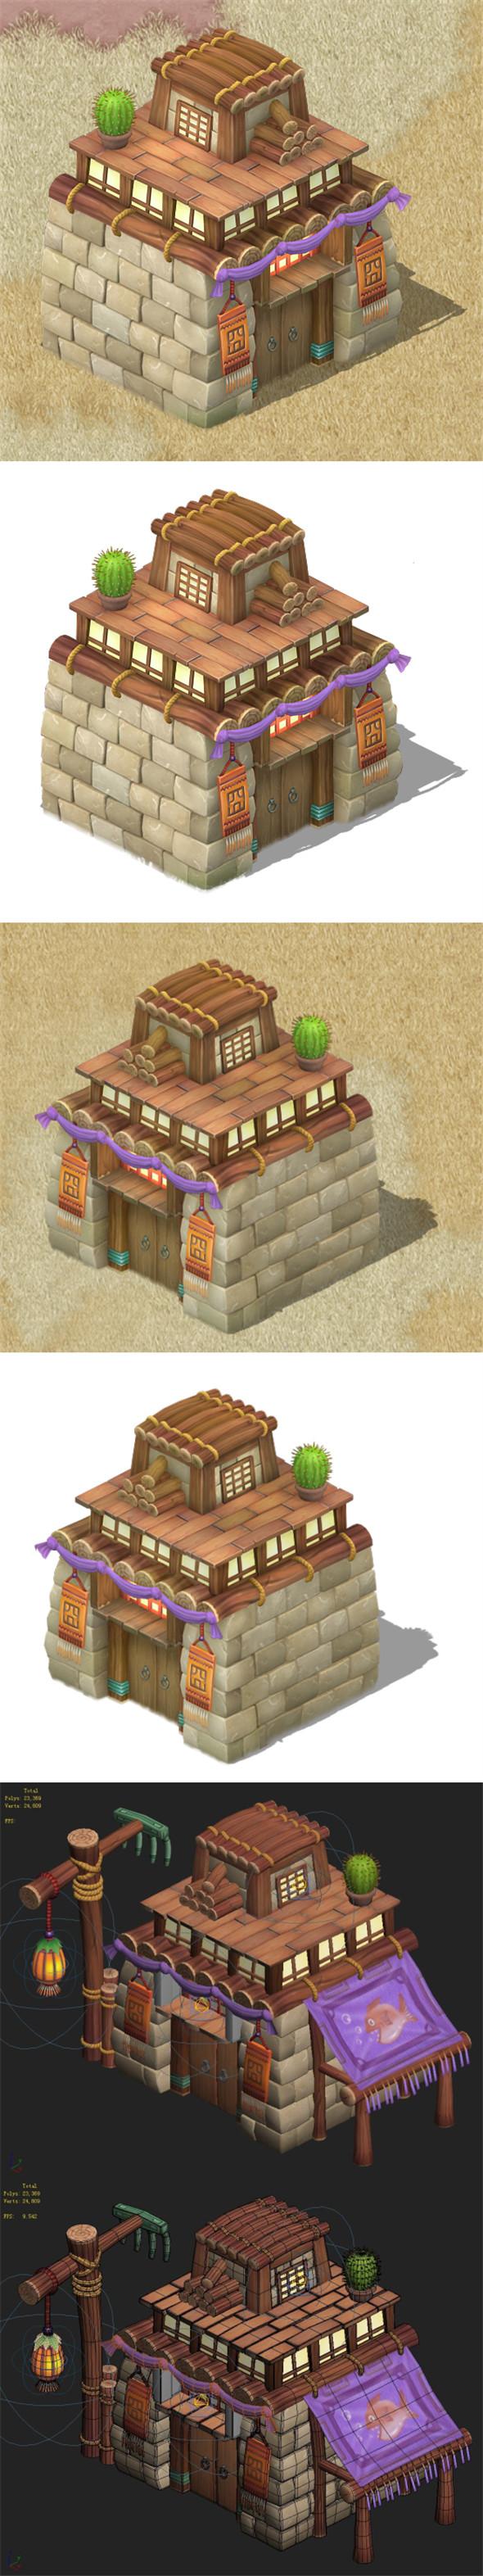 Cartoon version - House 0203 - 3DOcean Item for Sale